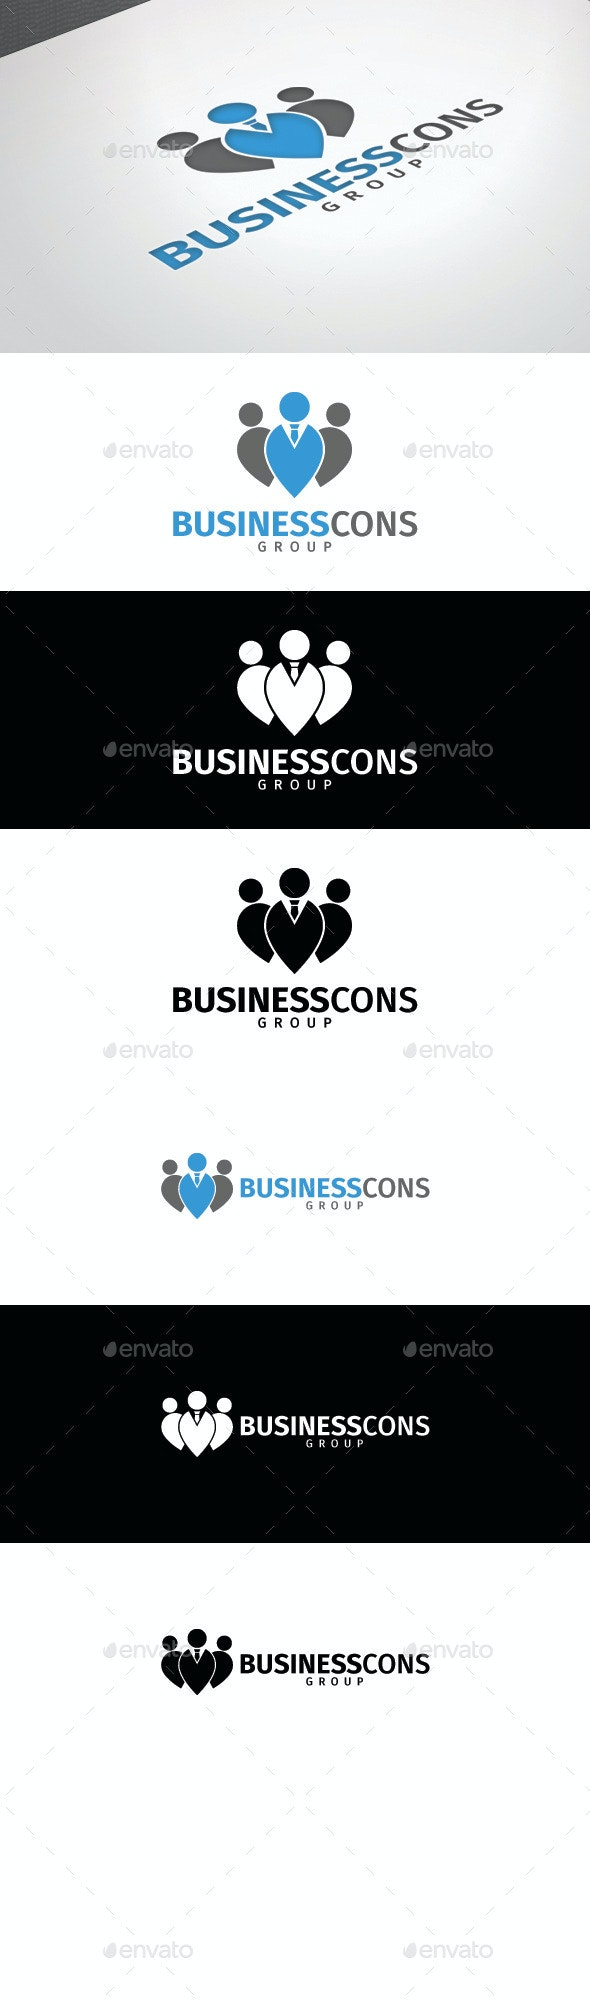 Business Cons Group Logo Template - Logo Templates